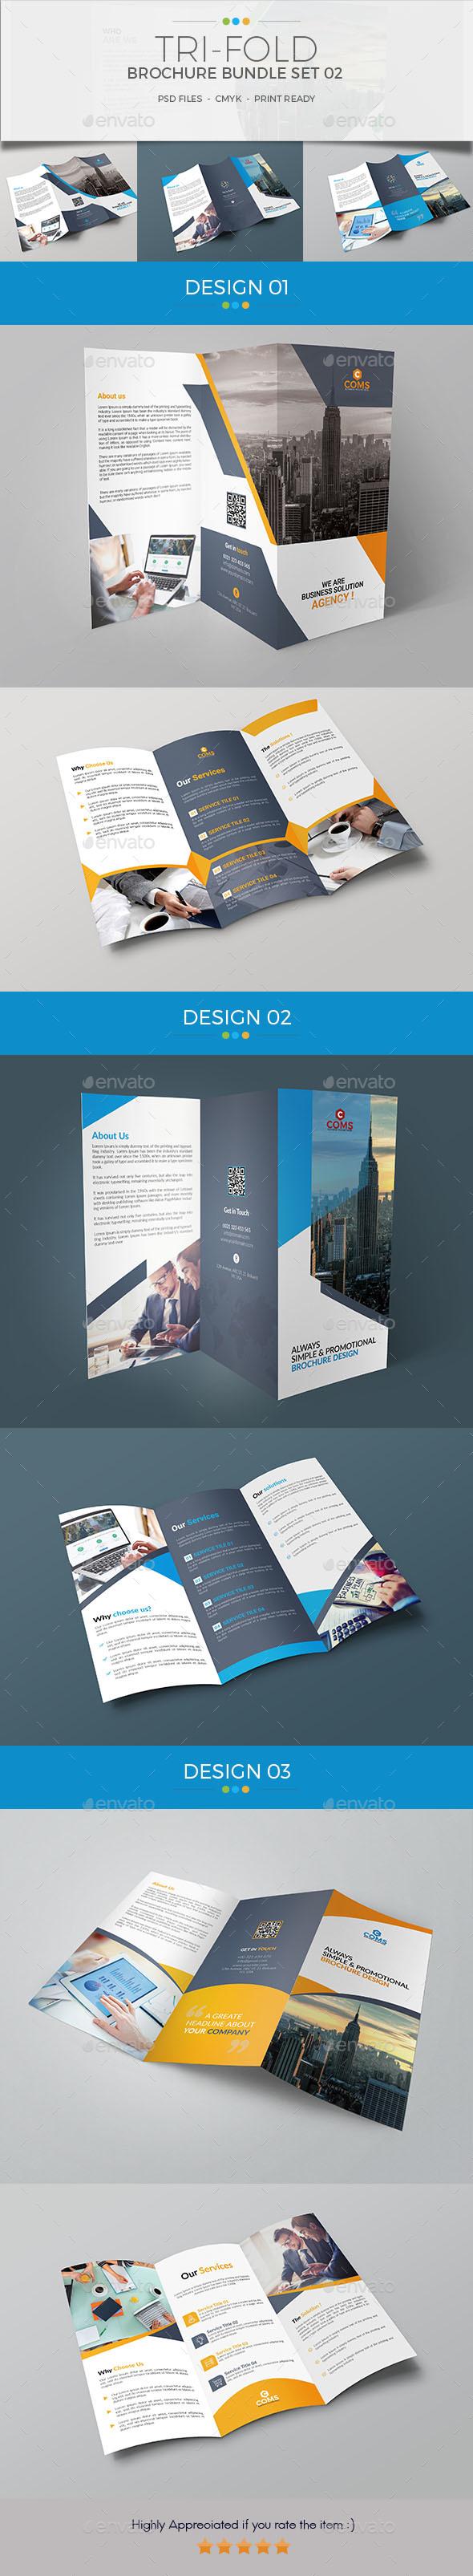 Trifold Brochure Bundle Set 02 - Corporate Brochures